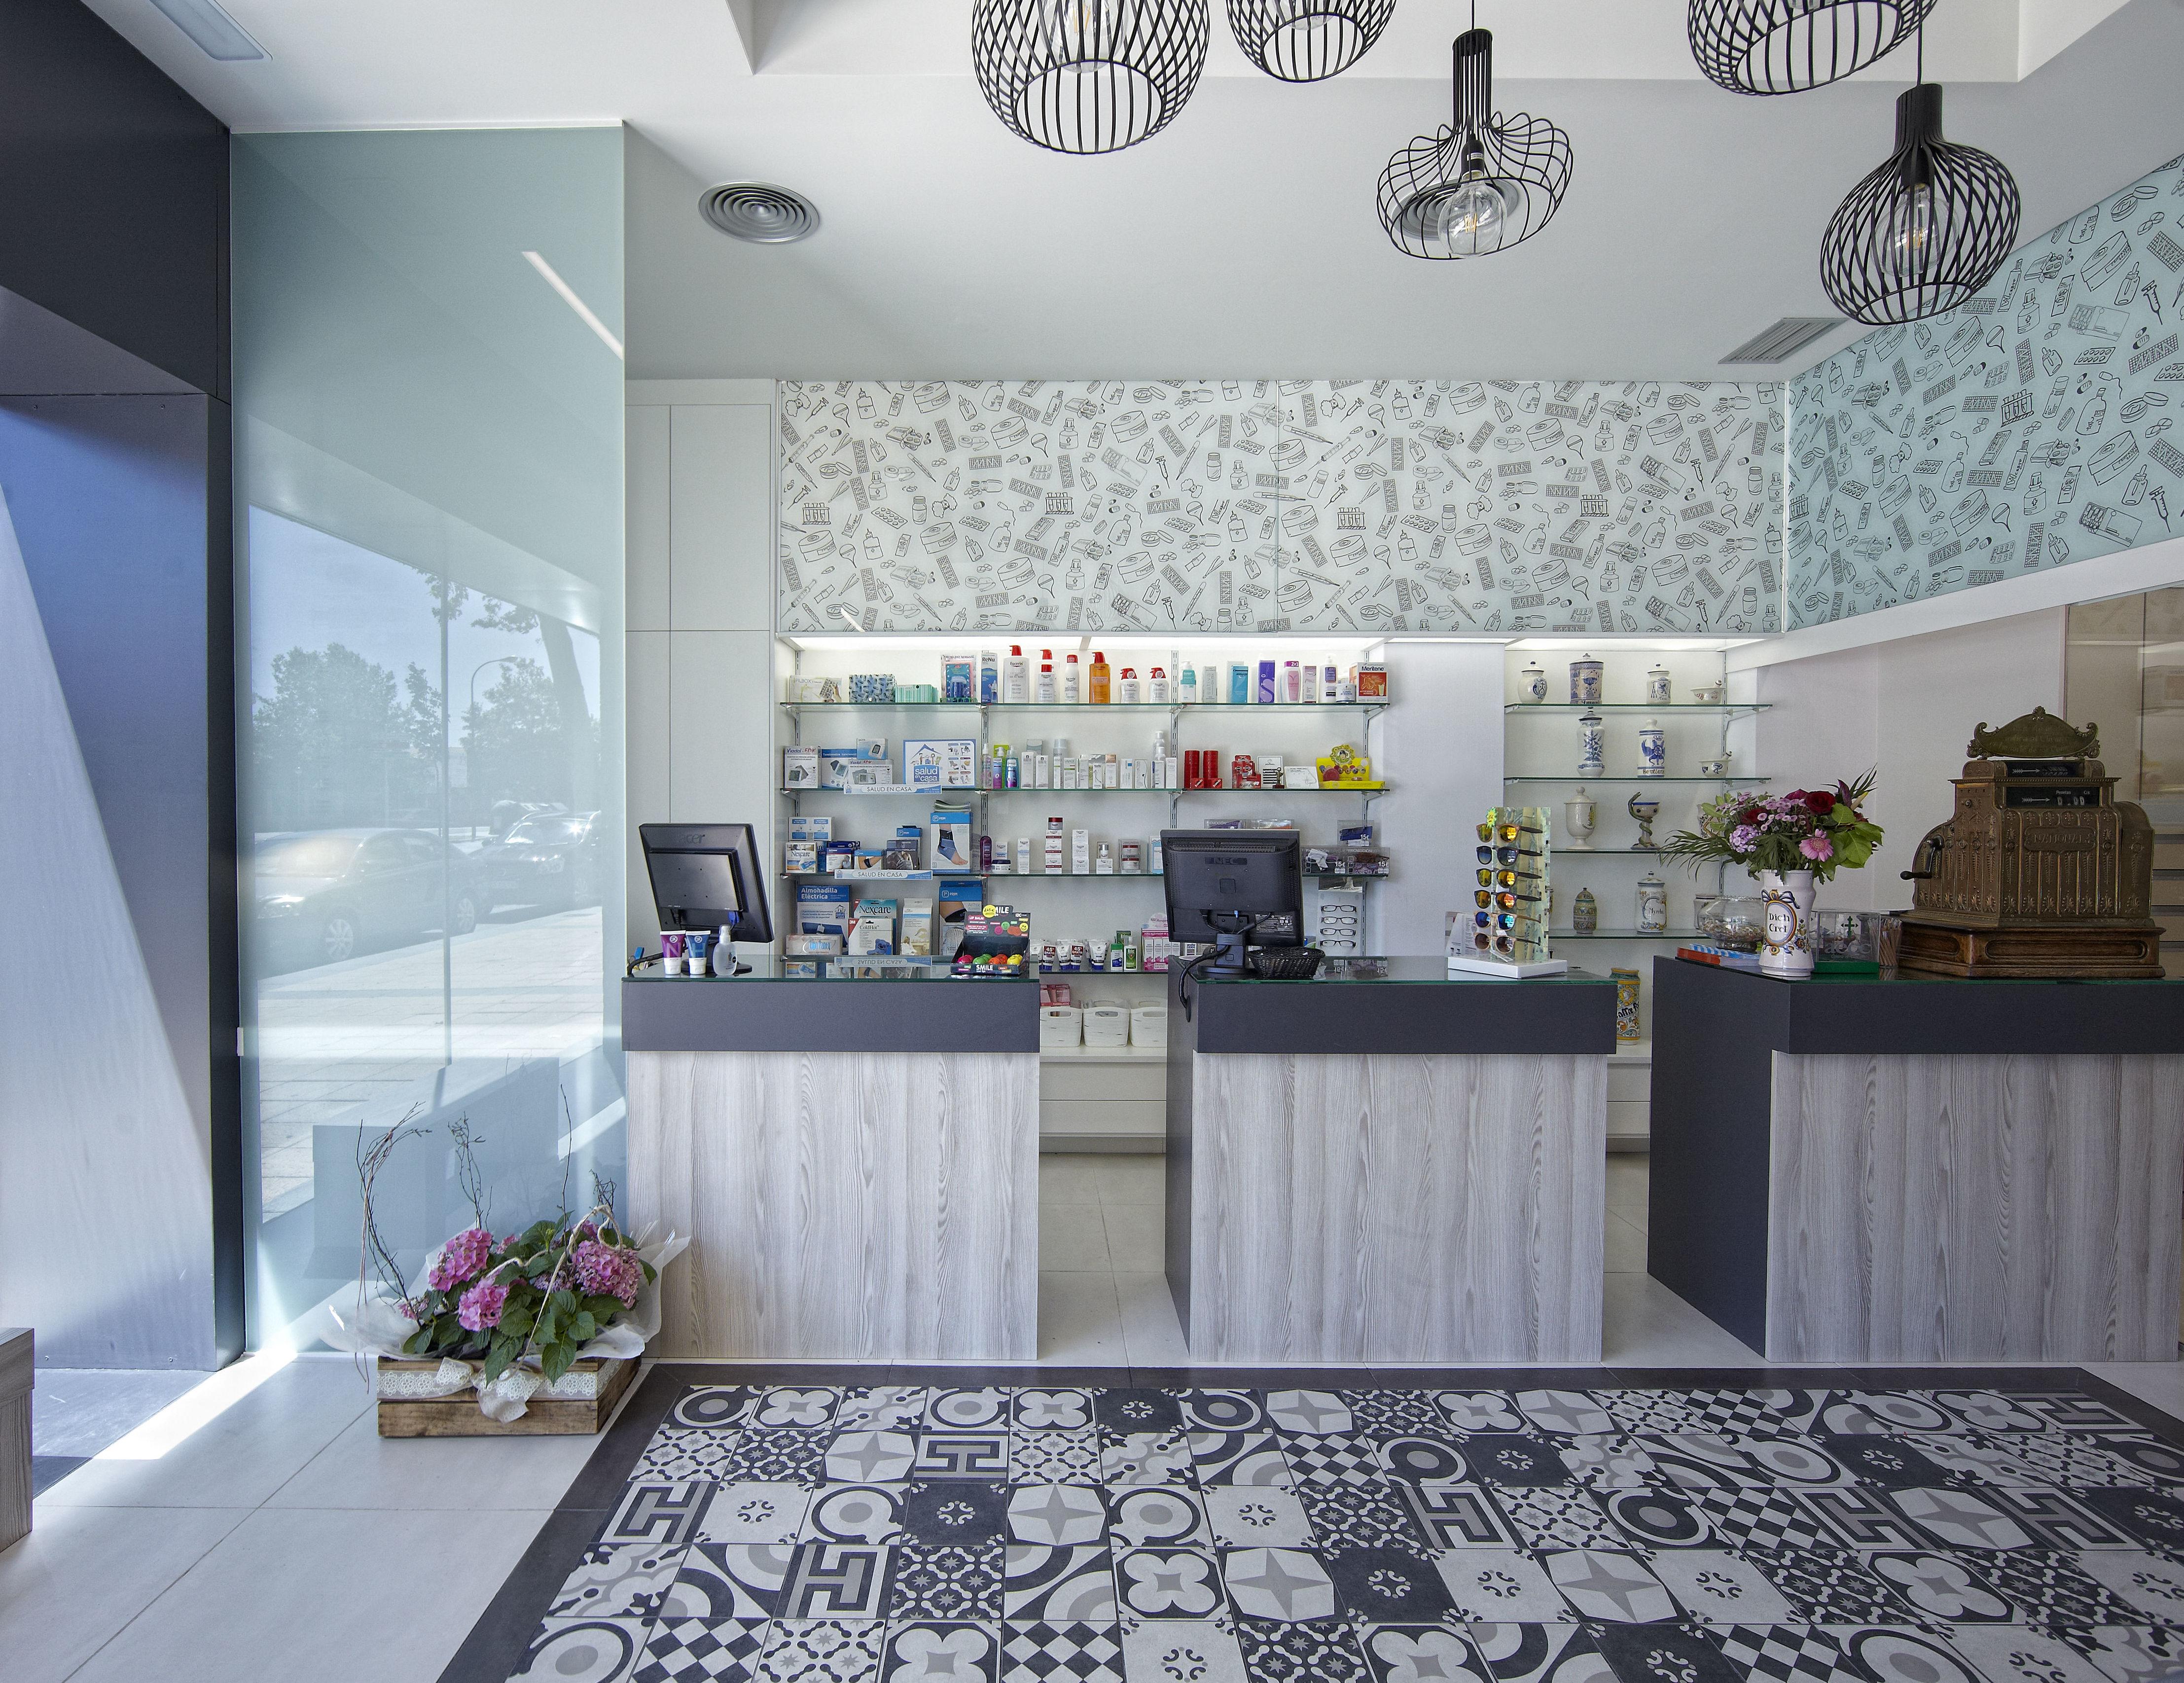 Foto 5 de Farmacias en Burgos | Farmacia Margarita Medrano Ruiz